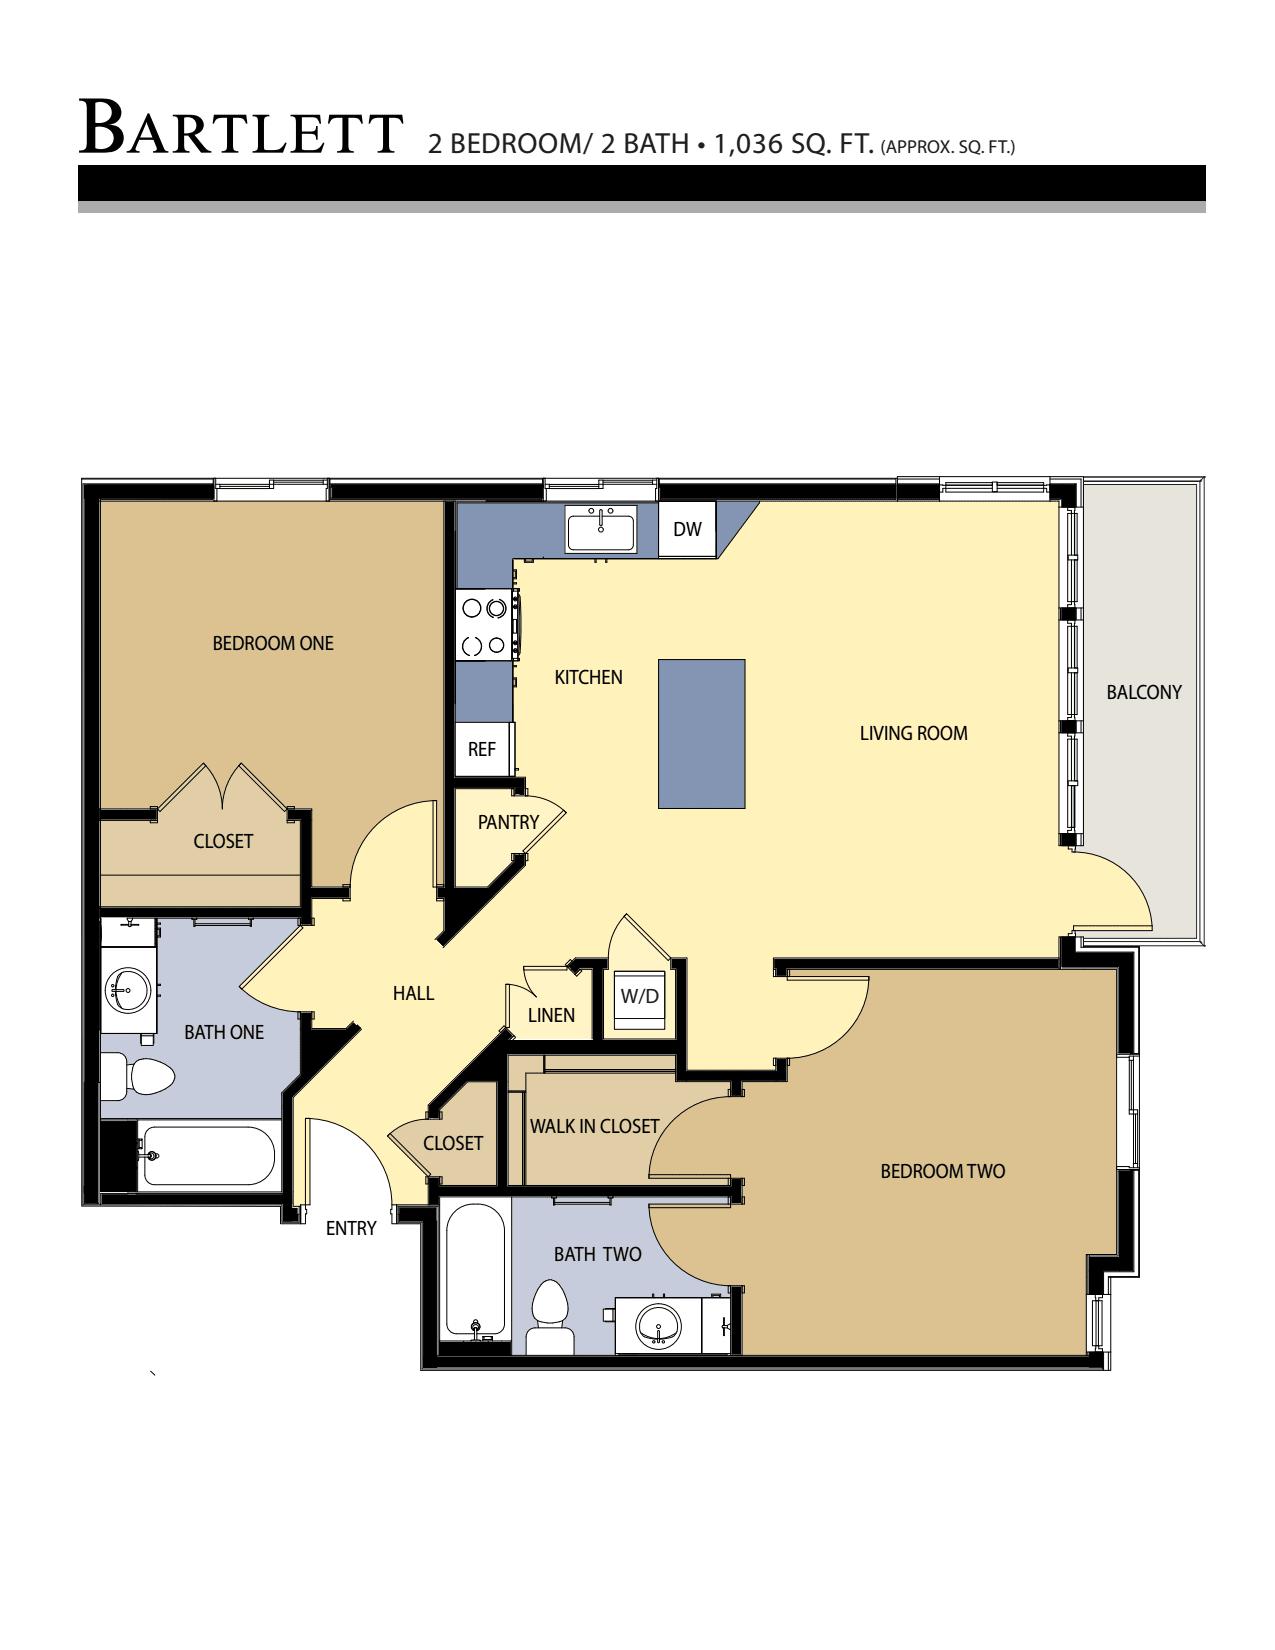 BARTLETT floor plan - 2 Bed / 2 Bath (1,036 Sq Ft)